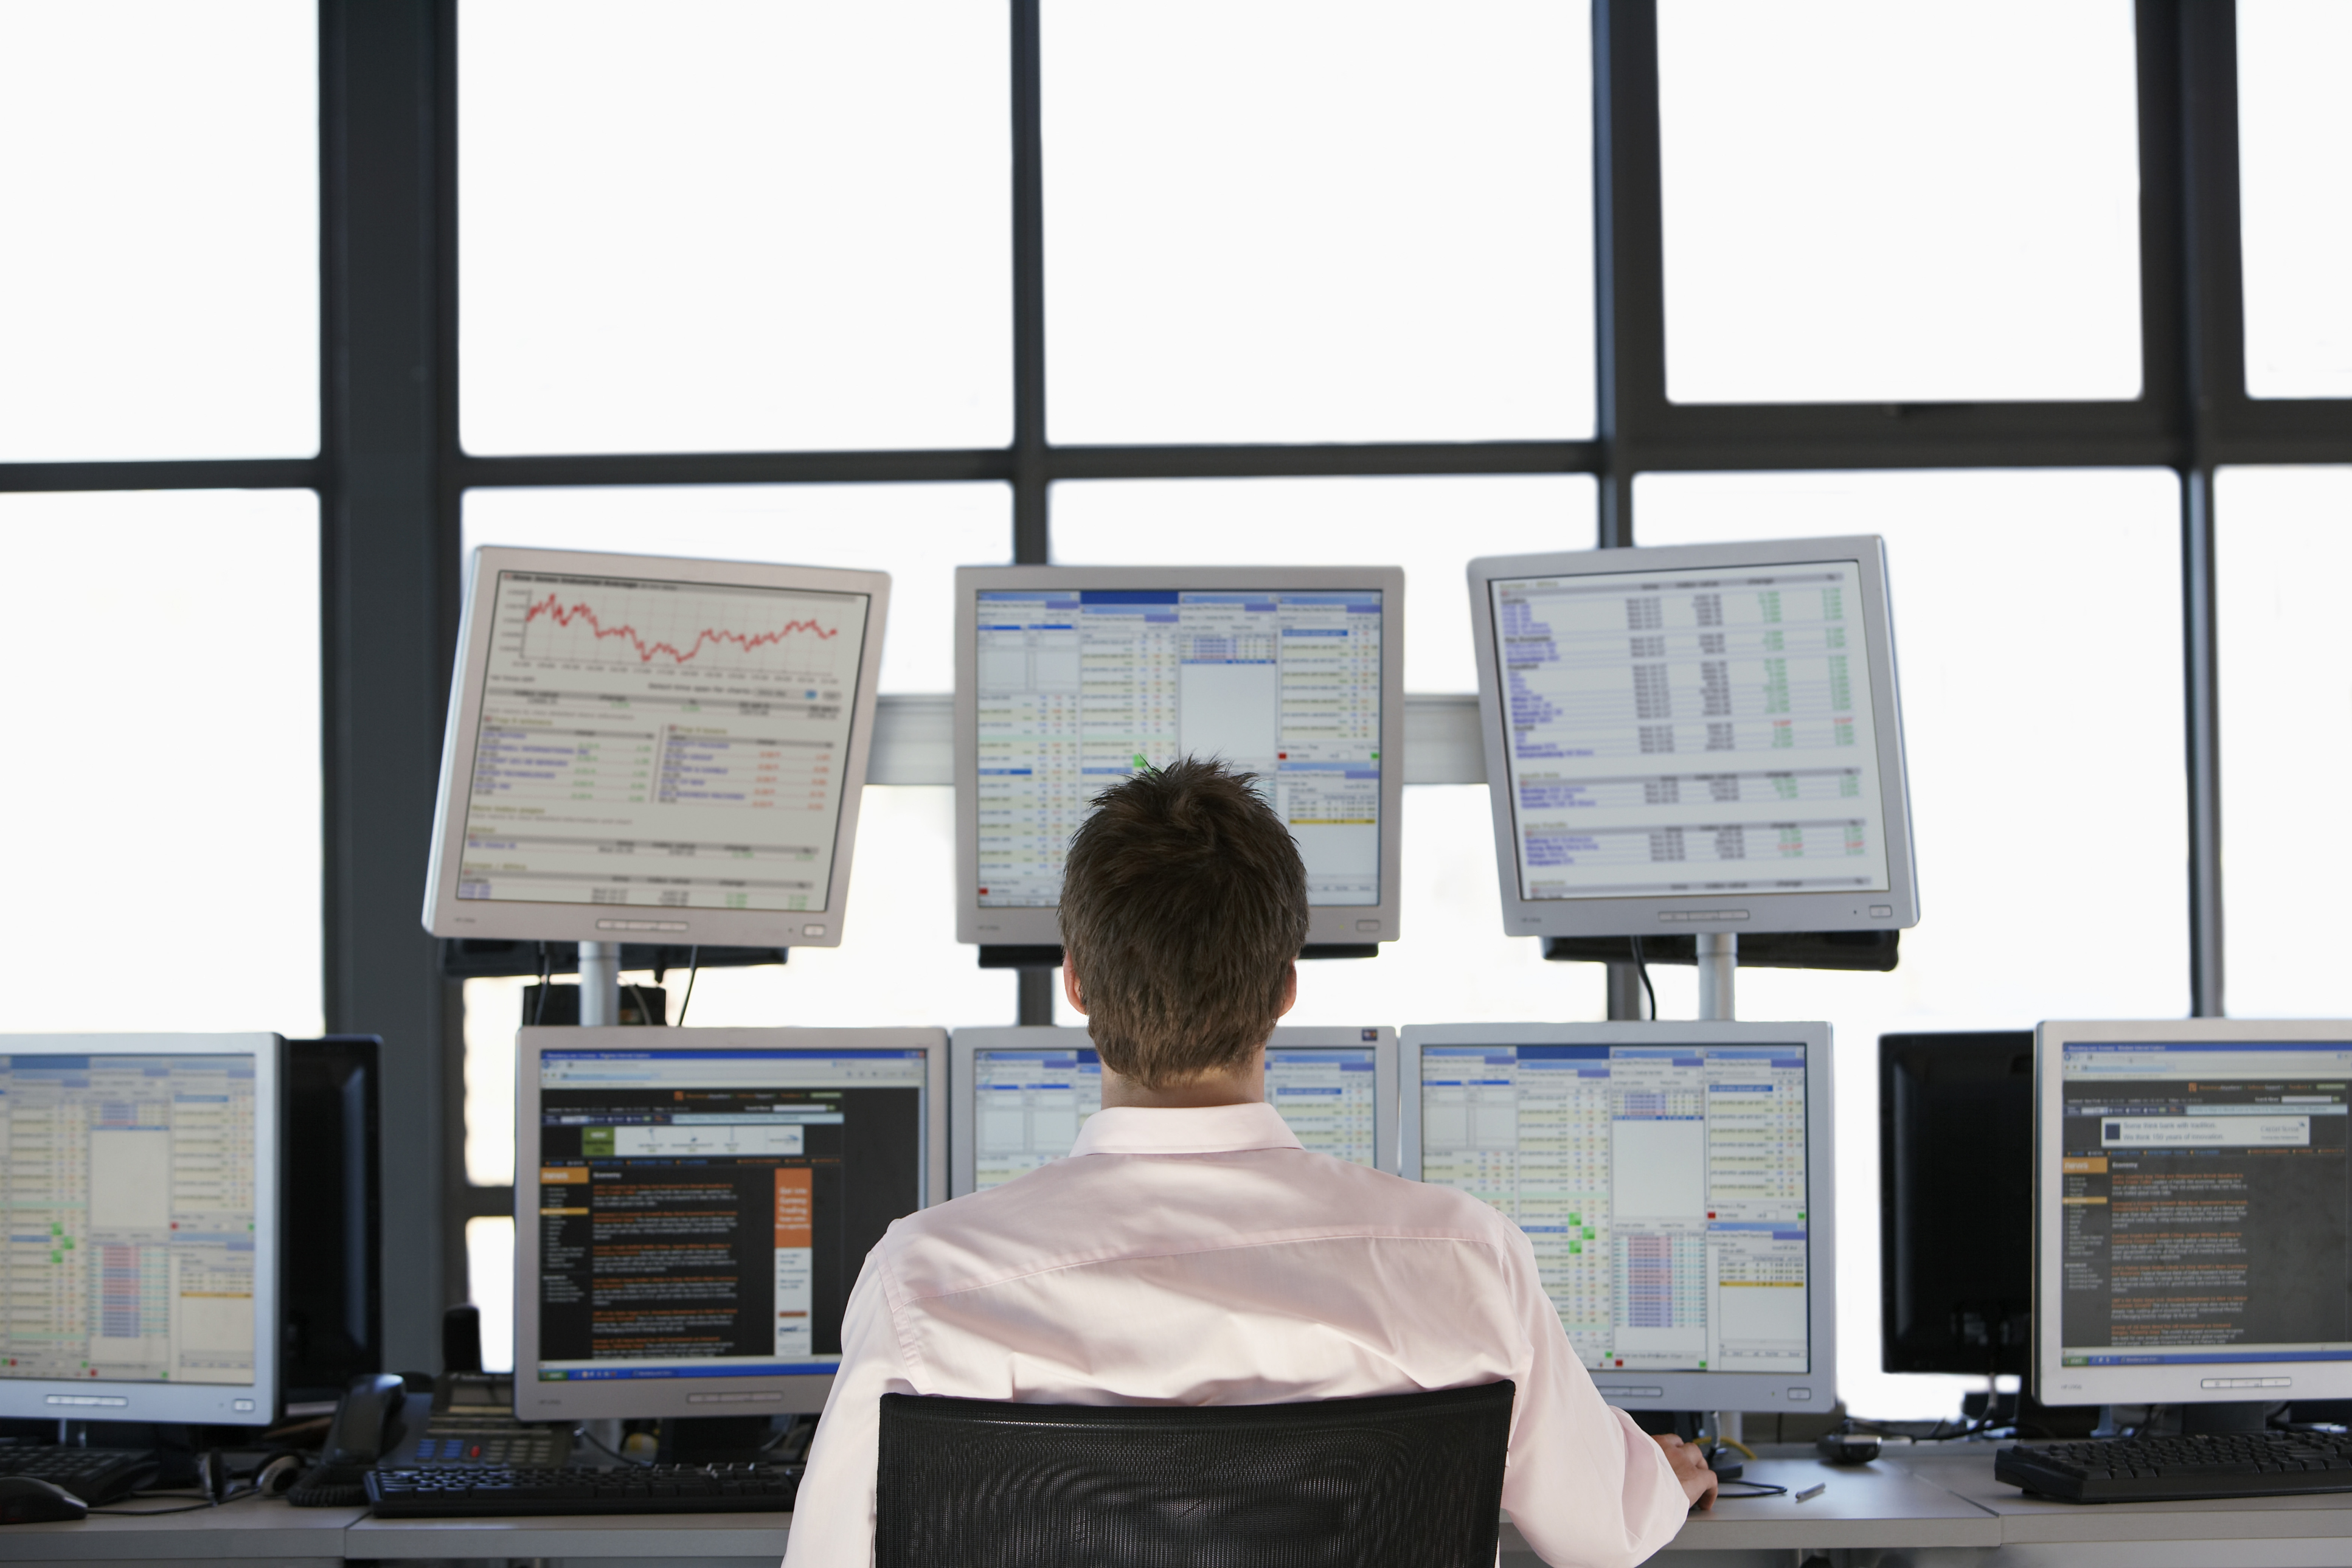 Businessmen Watching Data on Flat Panel Monitors